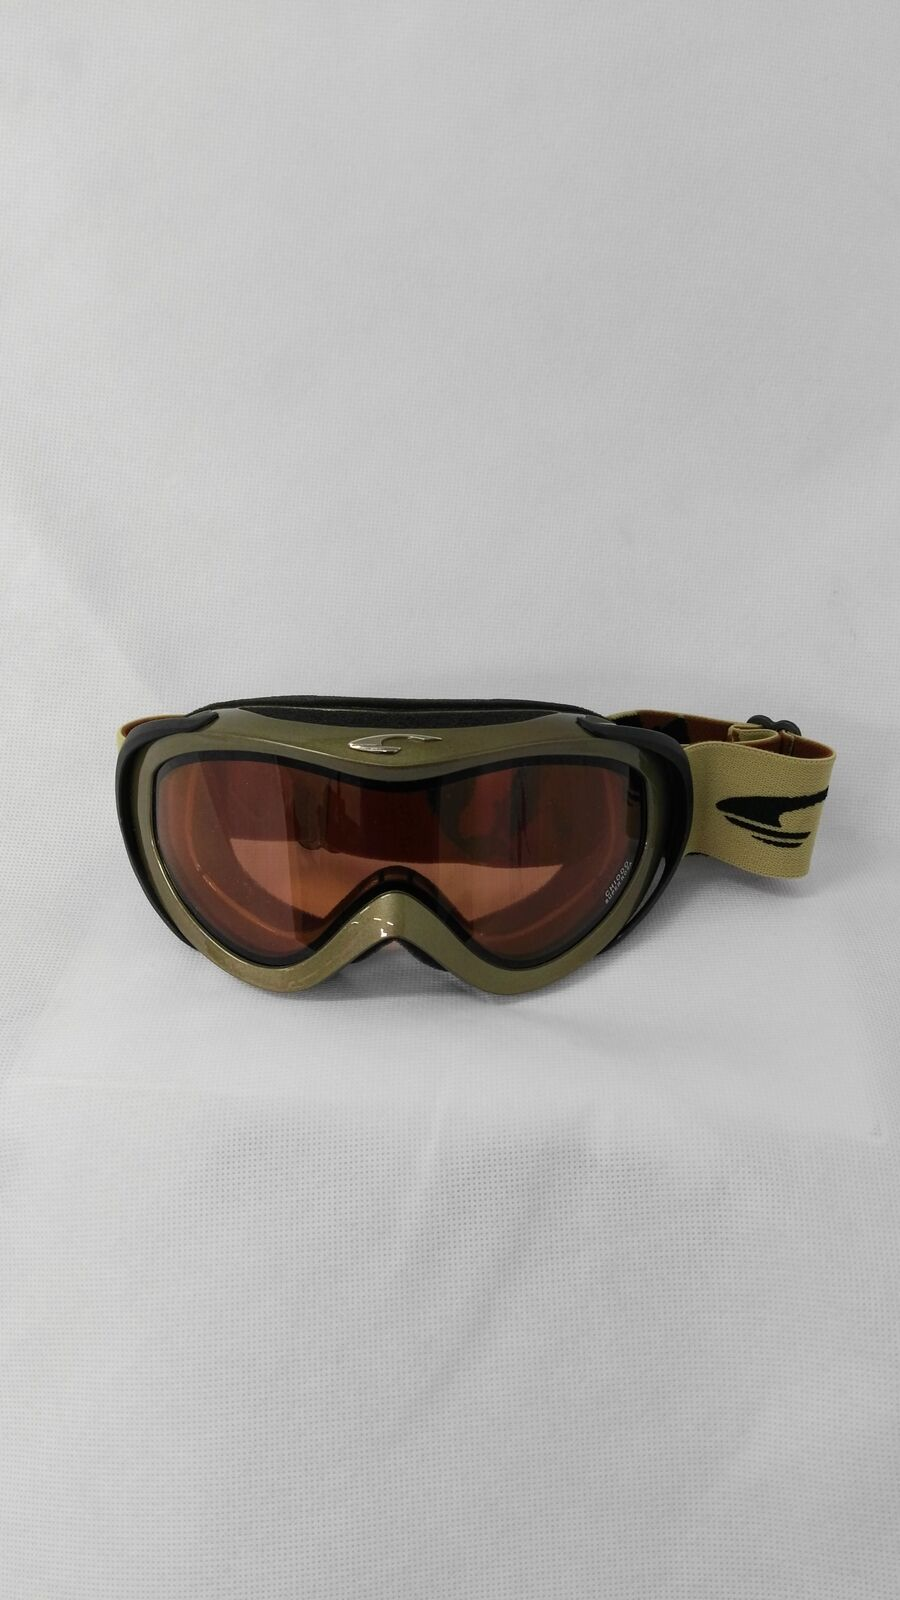 Carrera Glasses Skiing Screw Mask Snow Sport Winter Snowboard